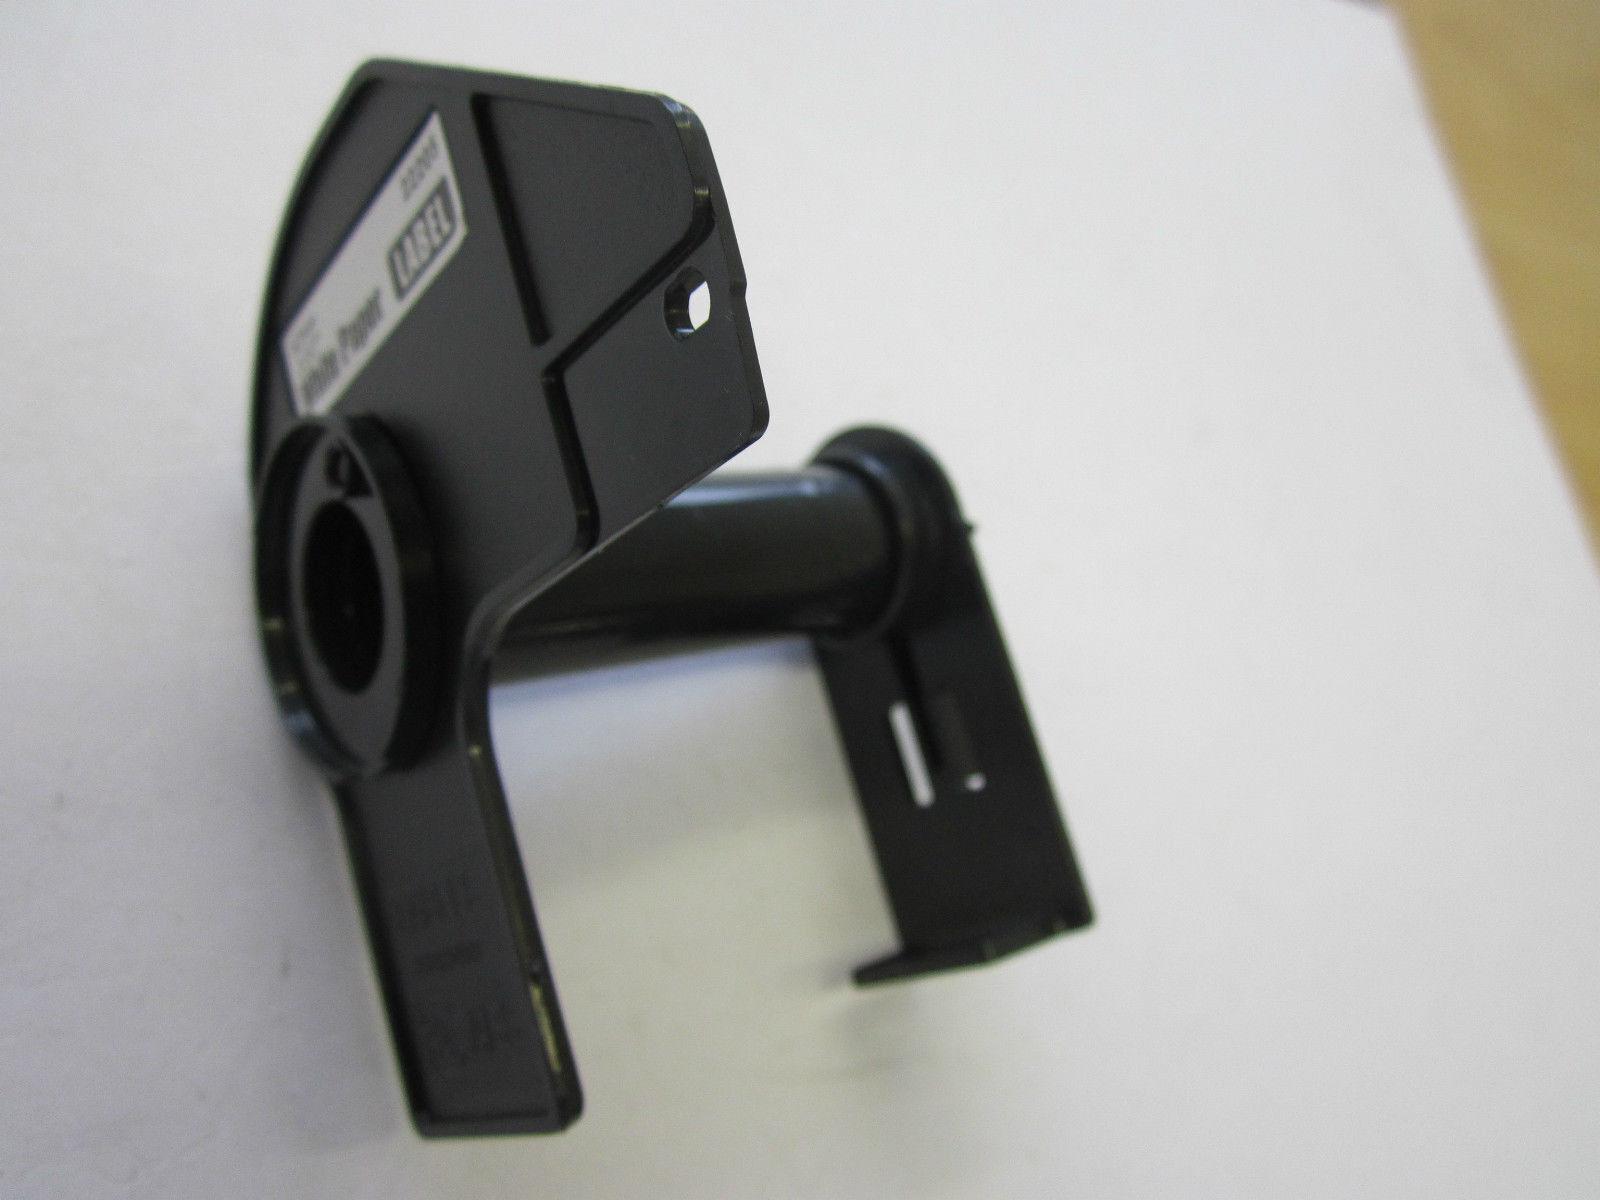 10x Brother Compatible DK11208 Printer Labels 38mm Roll+Spool for QL500 QL-500